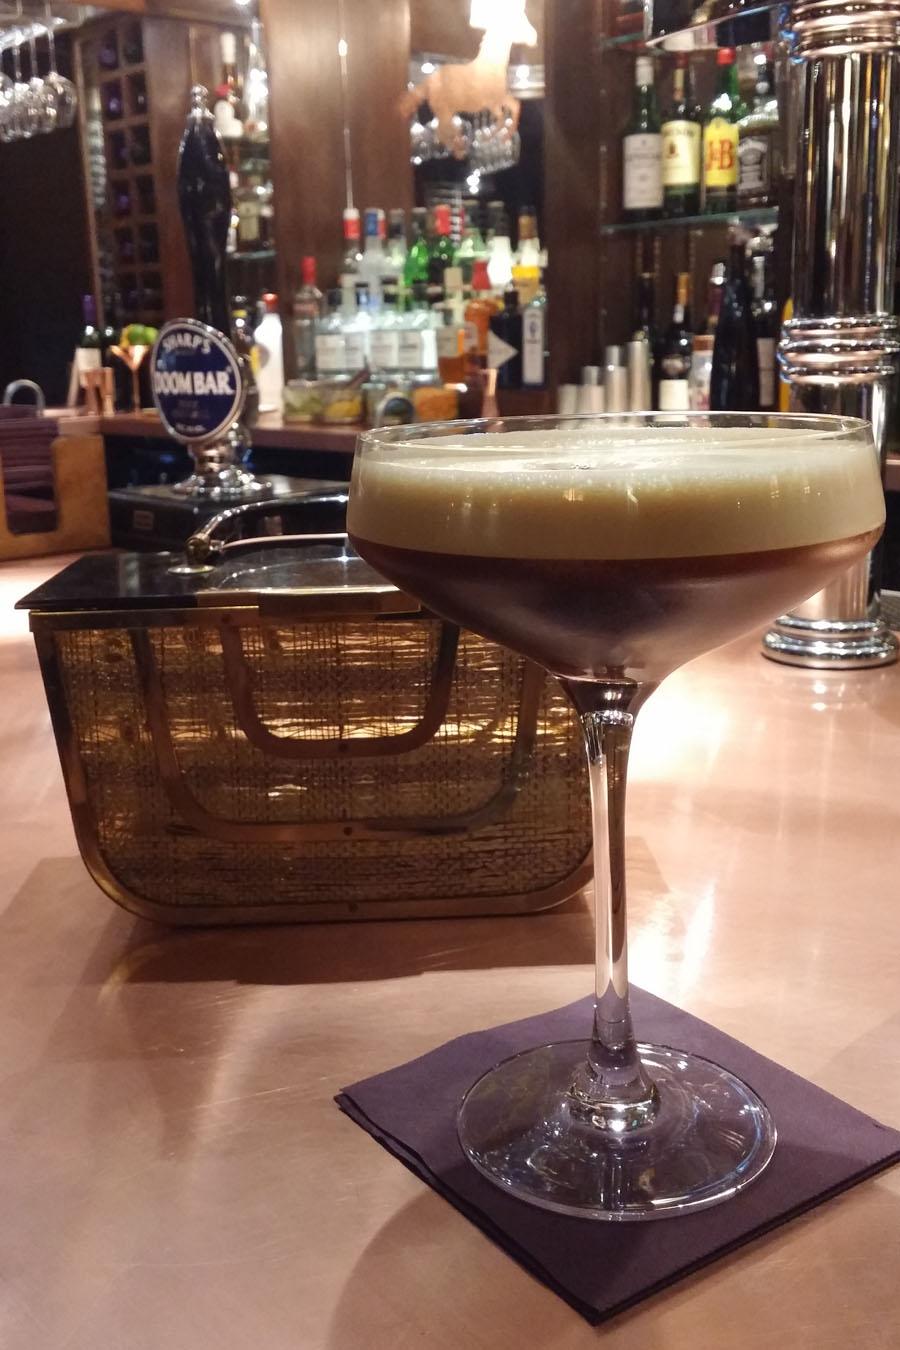 Espresso Martini and vintage handbag